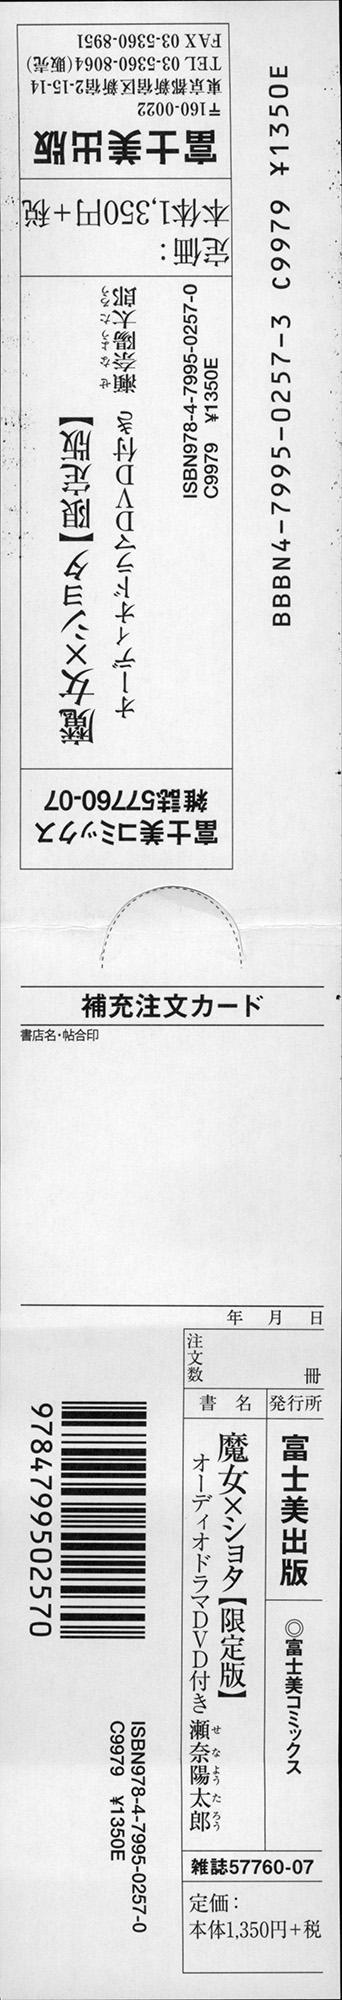 Majo × Shota ~ Genteiban | 魔女X小正太 限定版 269